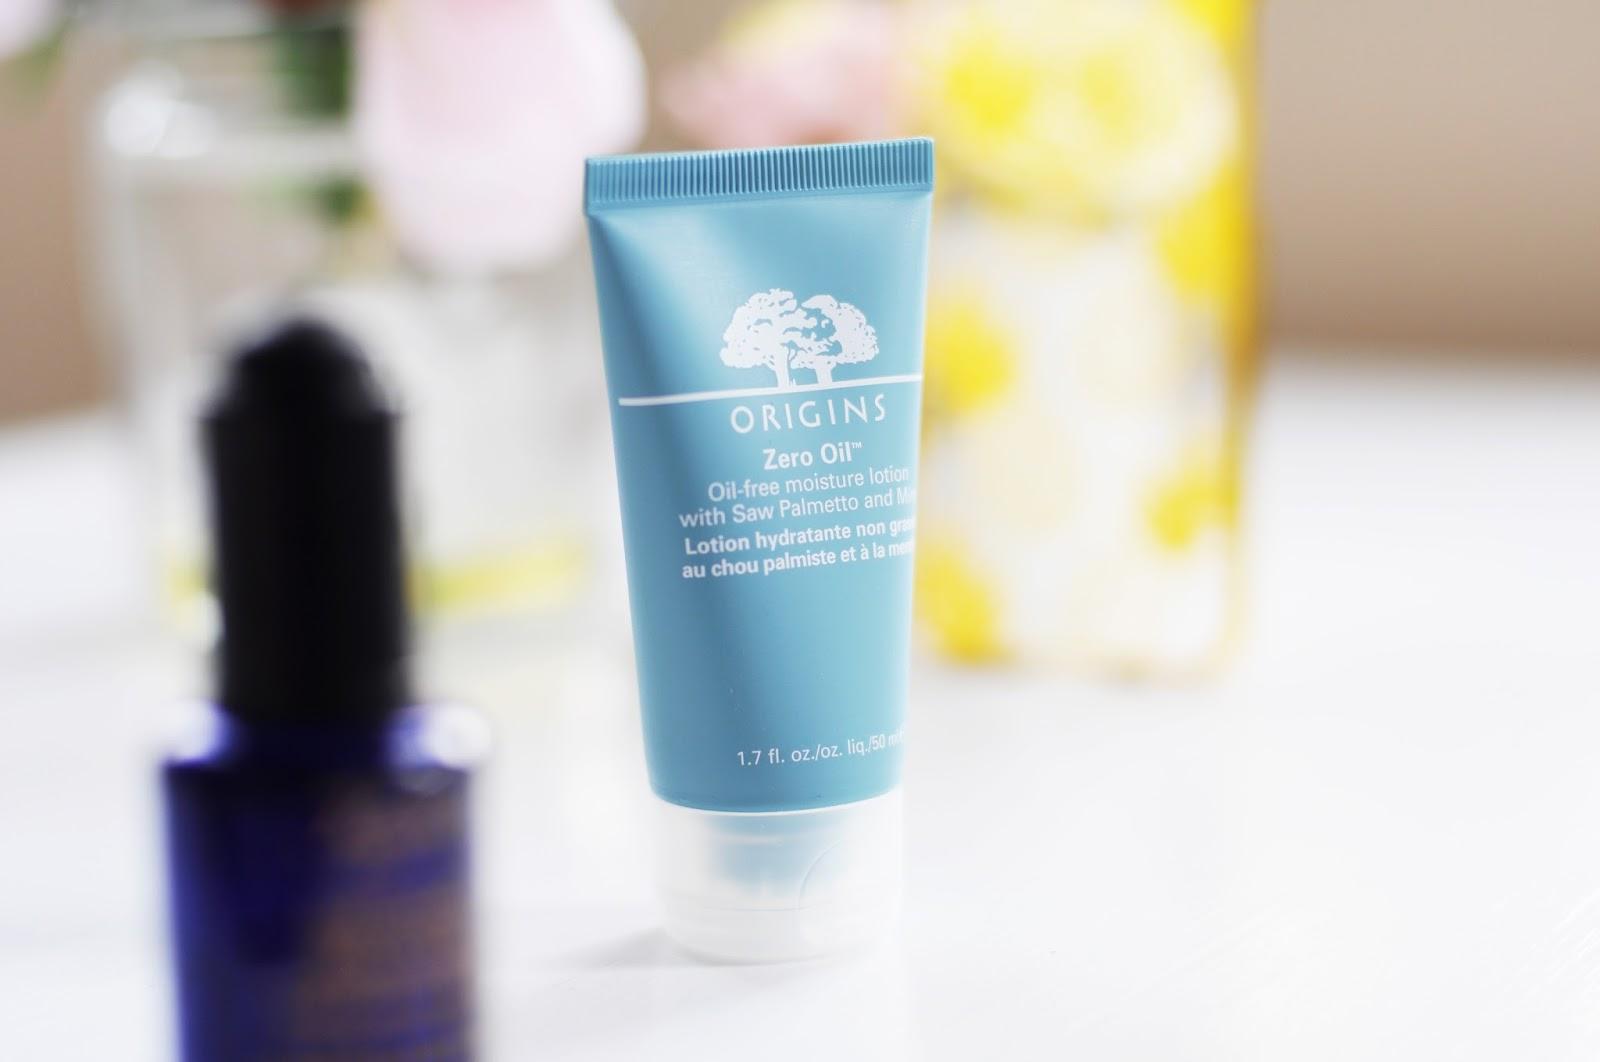 origins zero oil moisturiser